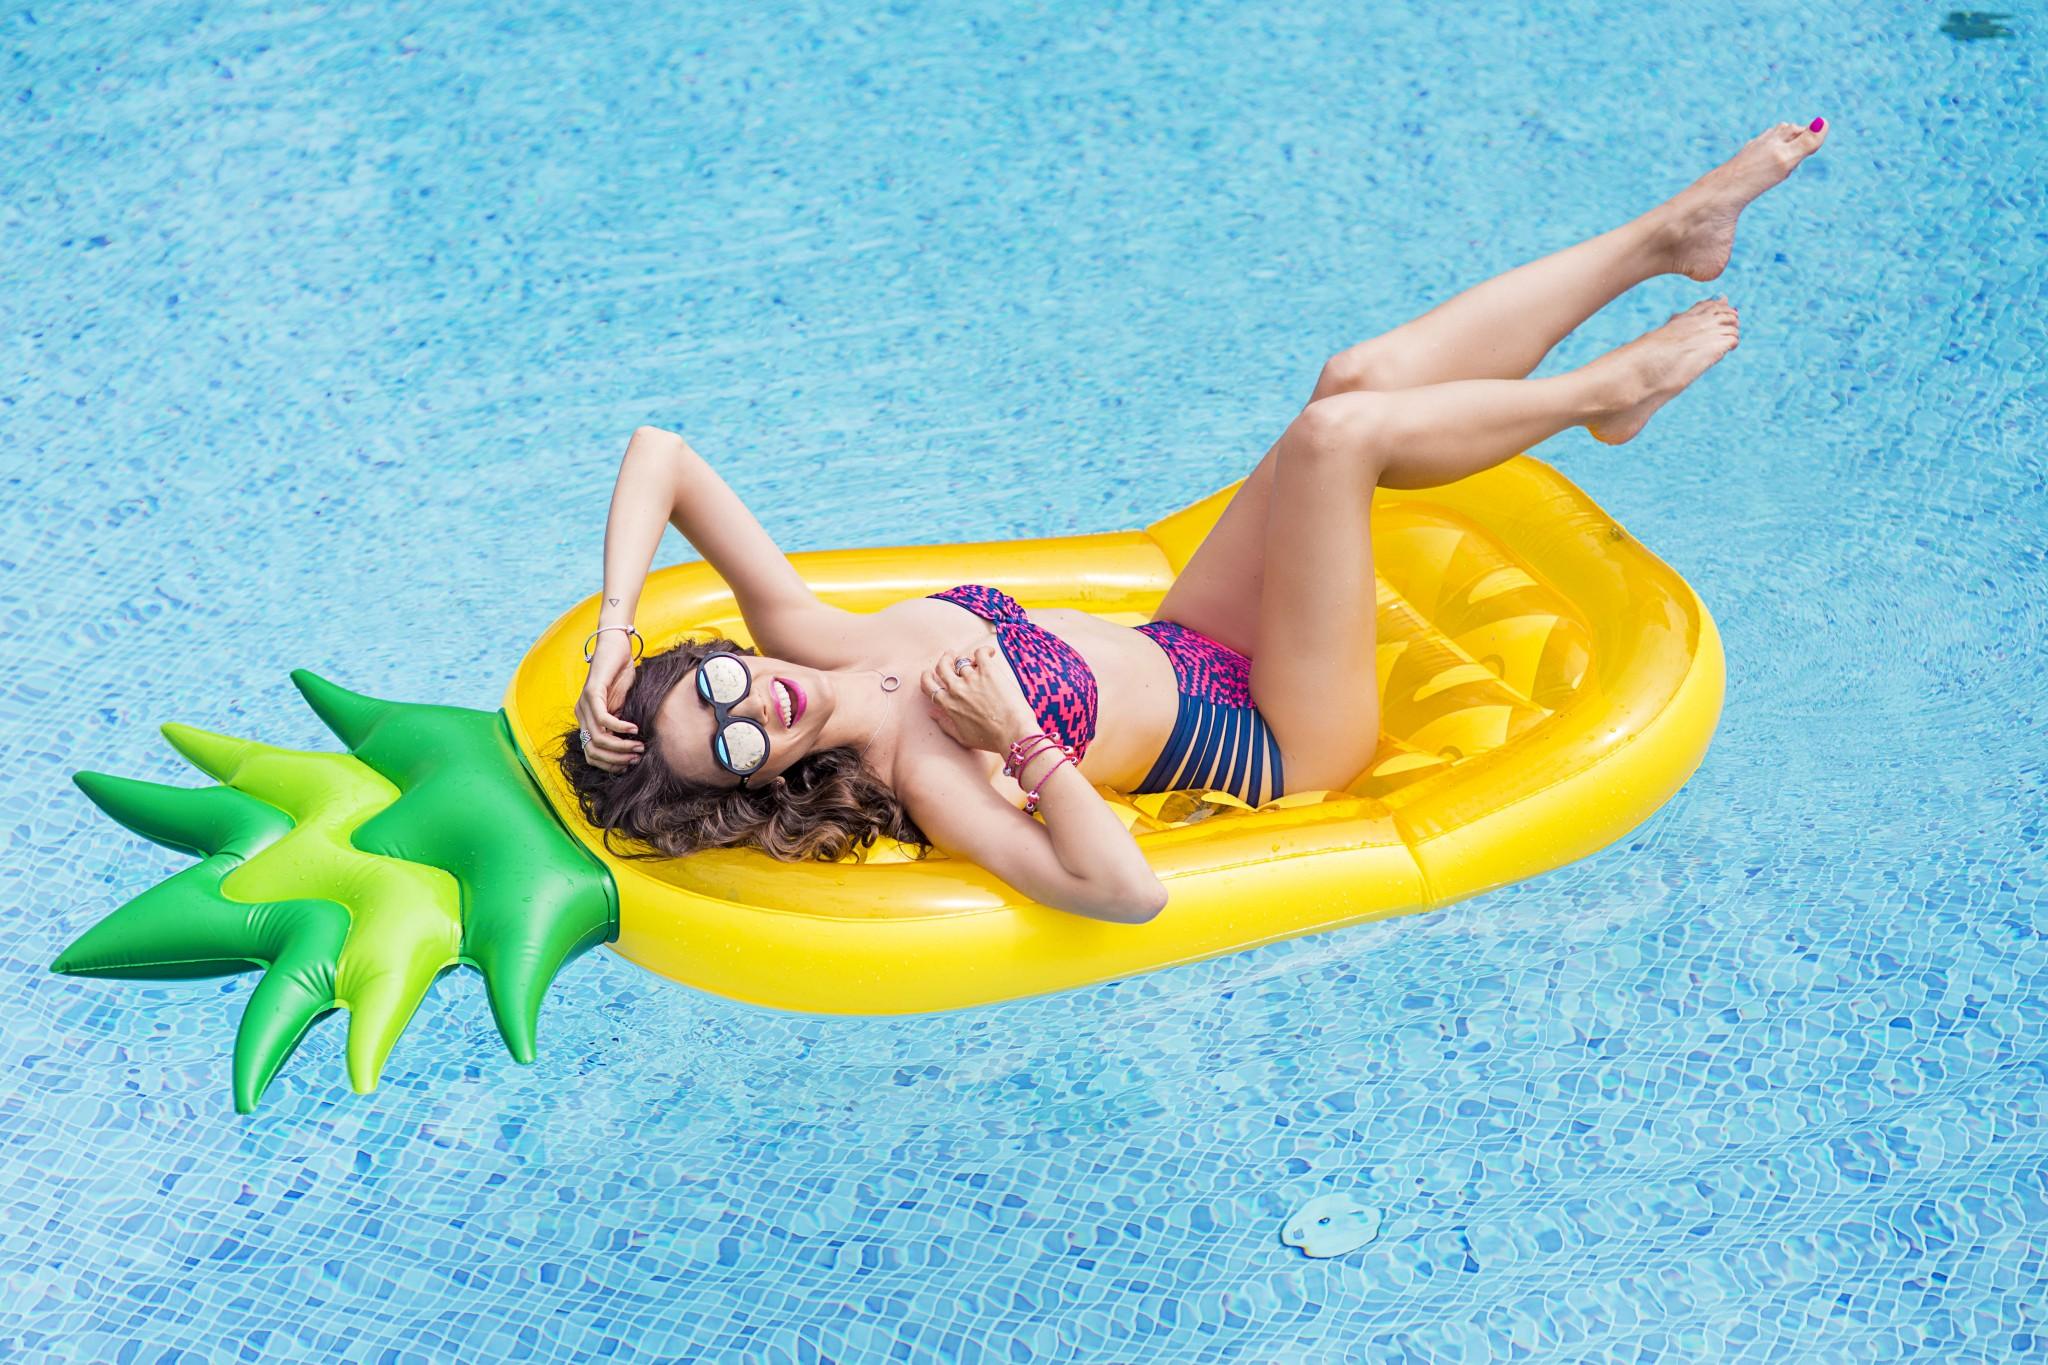 13fabulous_muses_pandora_summer2016_collection_youniverse_piscina